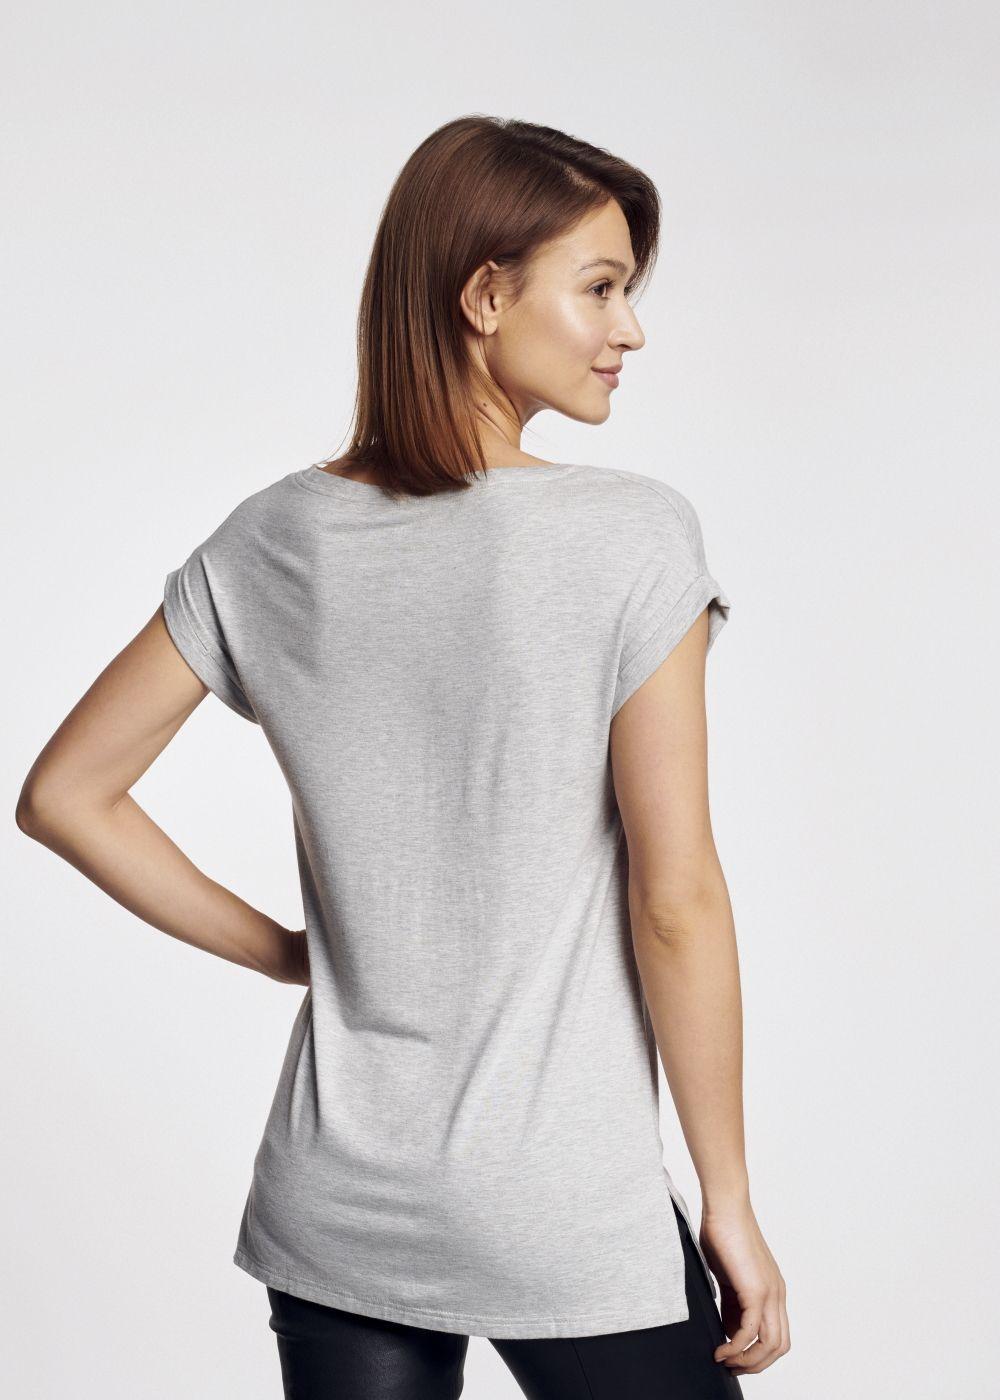 T-shirt damski TSHDT-0067-91(W21)